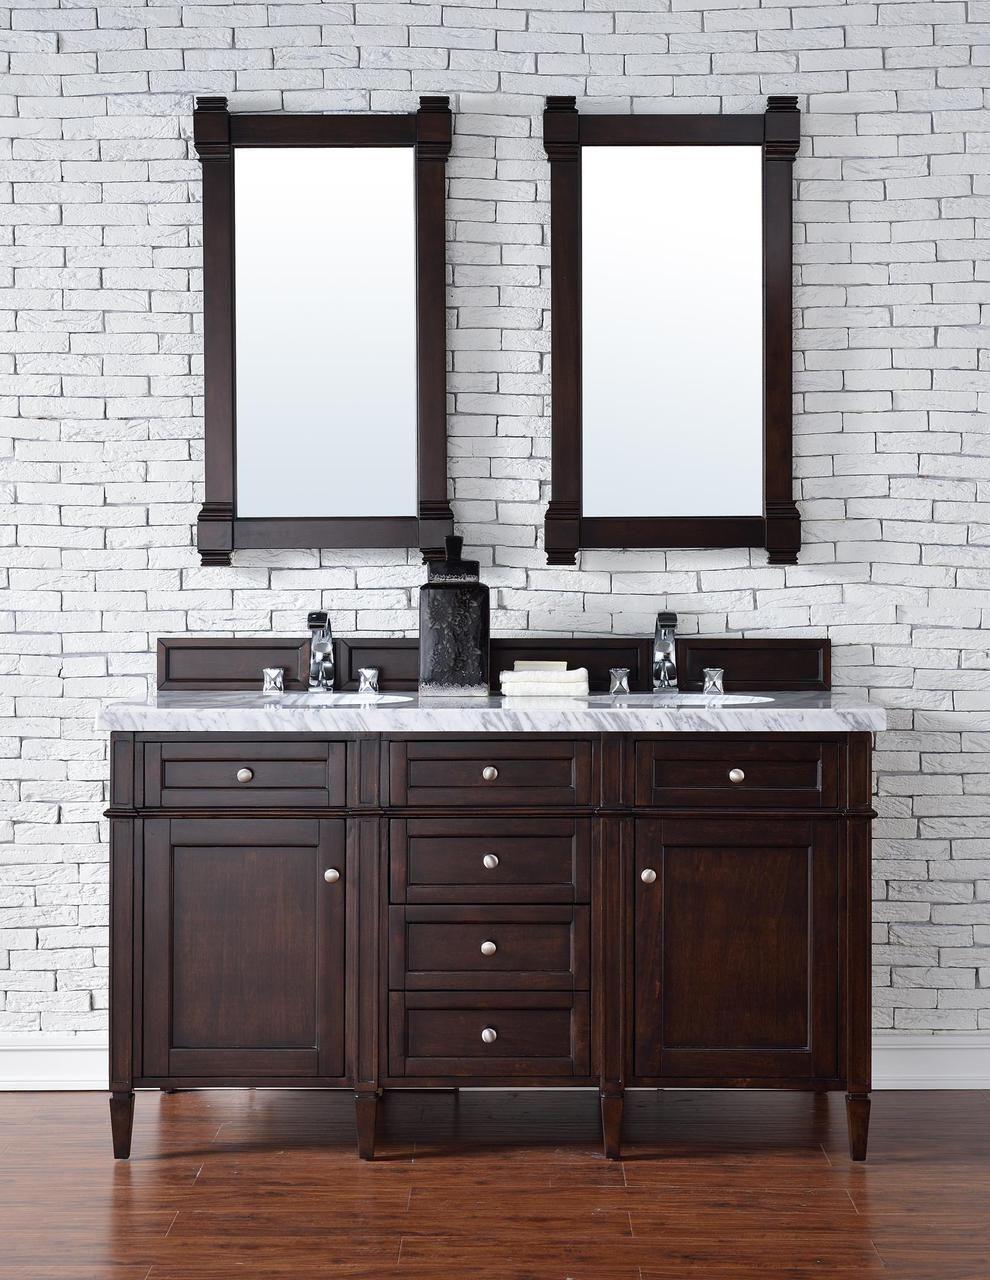 60 Inch Double Sink Contemporary Bathroom Vanity Mahogany Finish Optional Tops James Martin Furniture Double Sink Bathroom Vanity 60 Inch Double Vanity